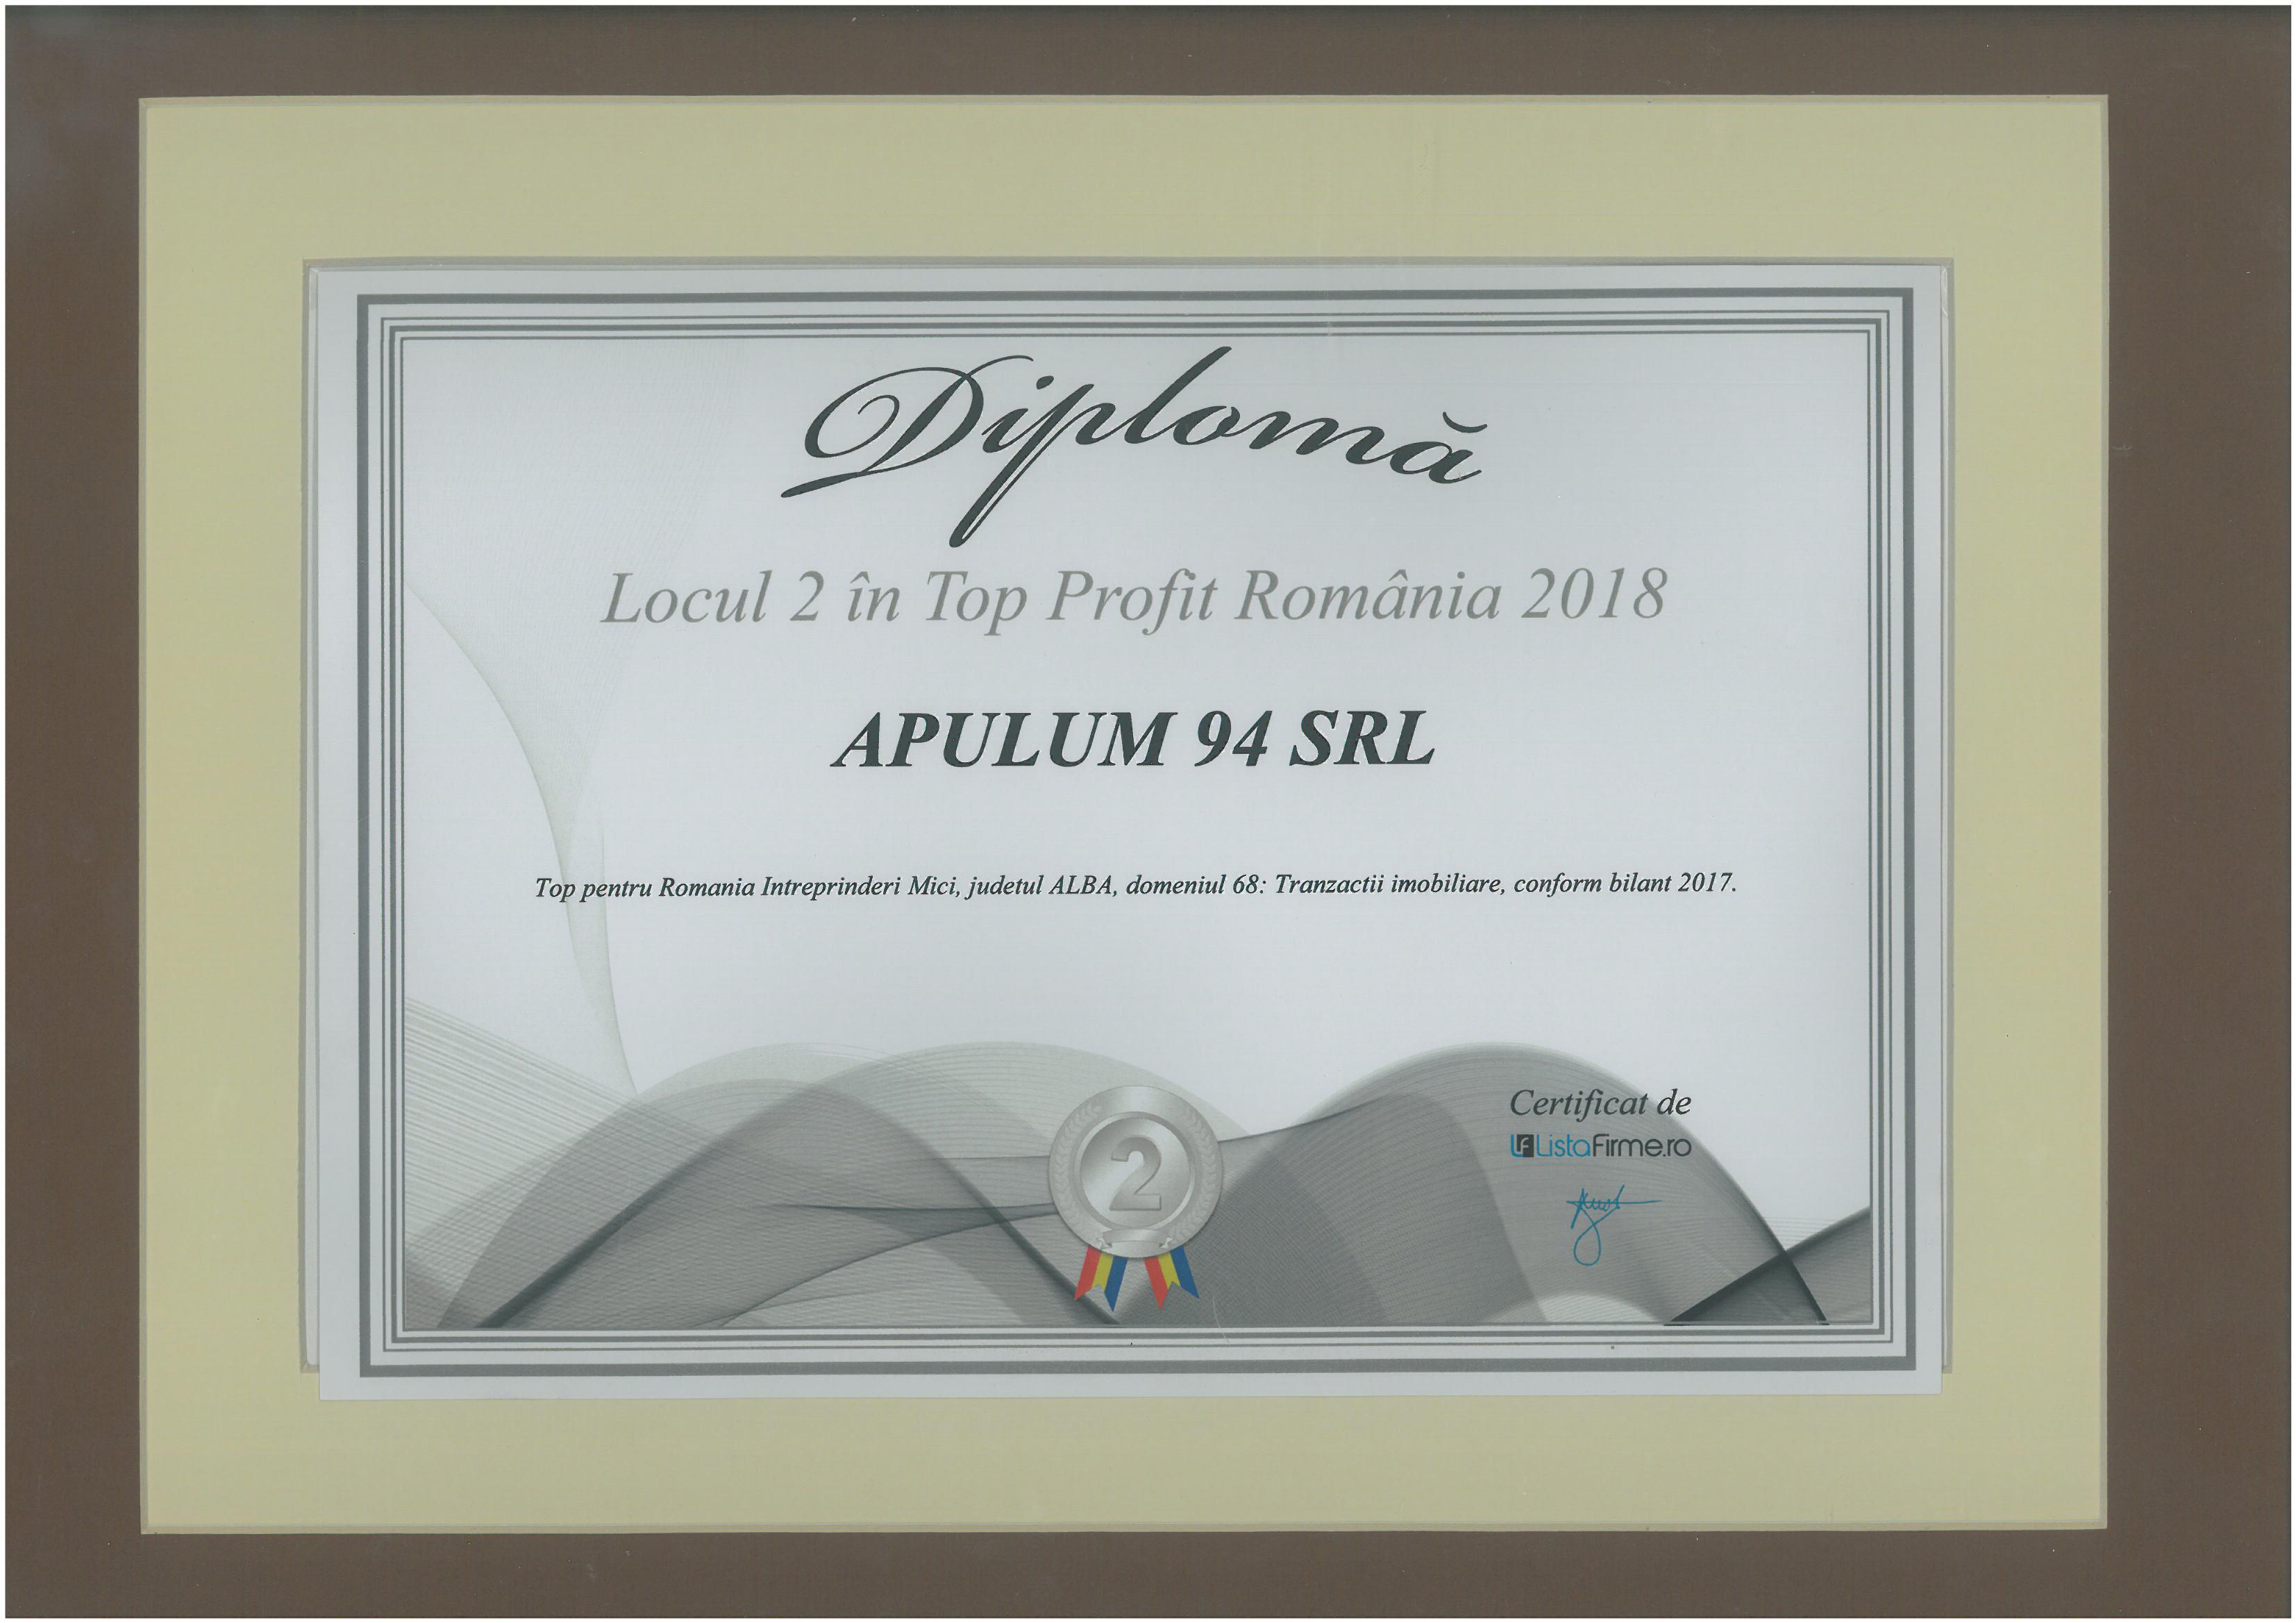 Top Profit Romania – 2018 - Locul 2